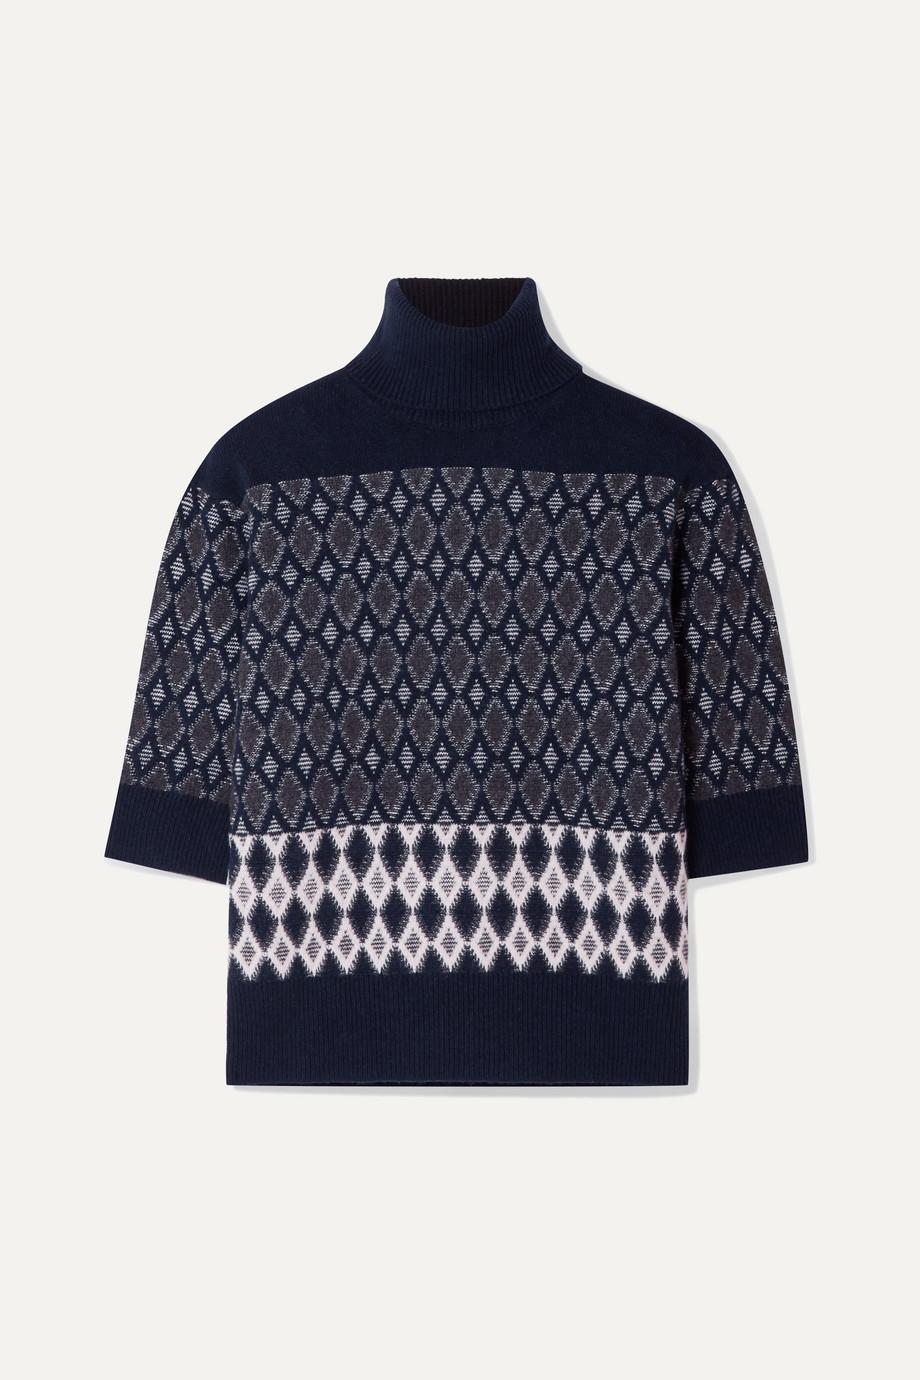 Chloé Intarsia merino wool-blend turtleneck sweater